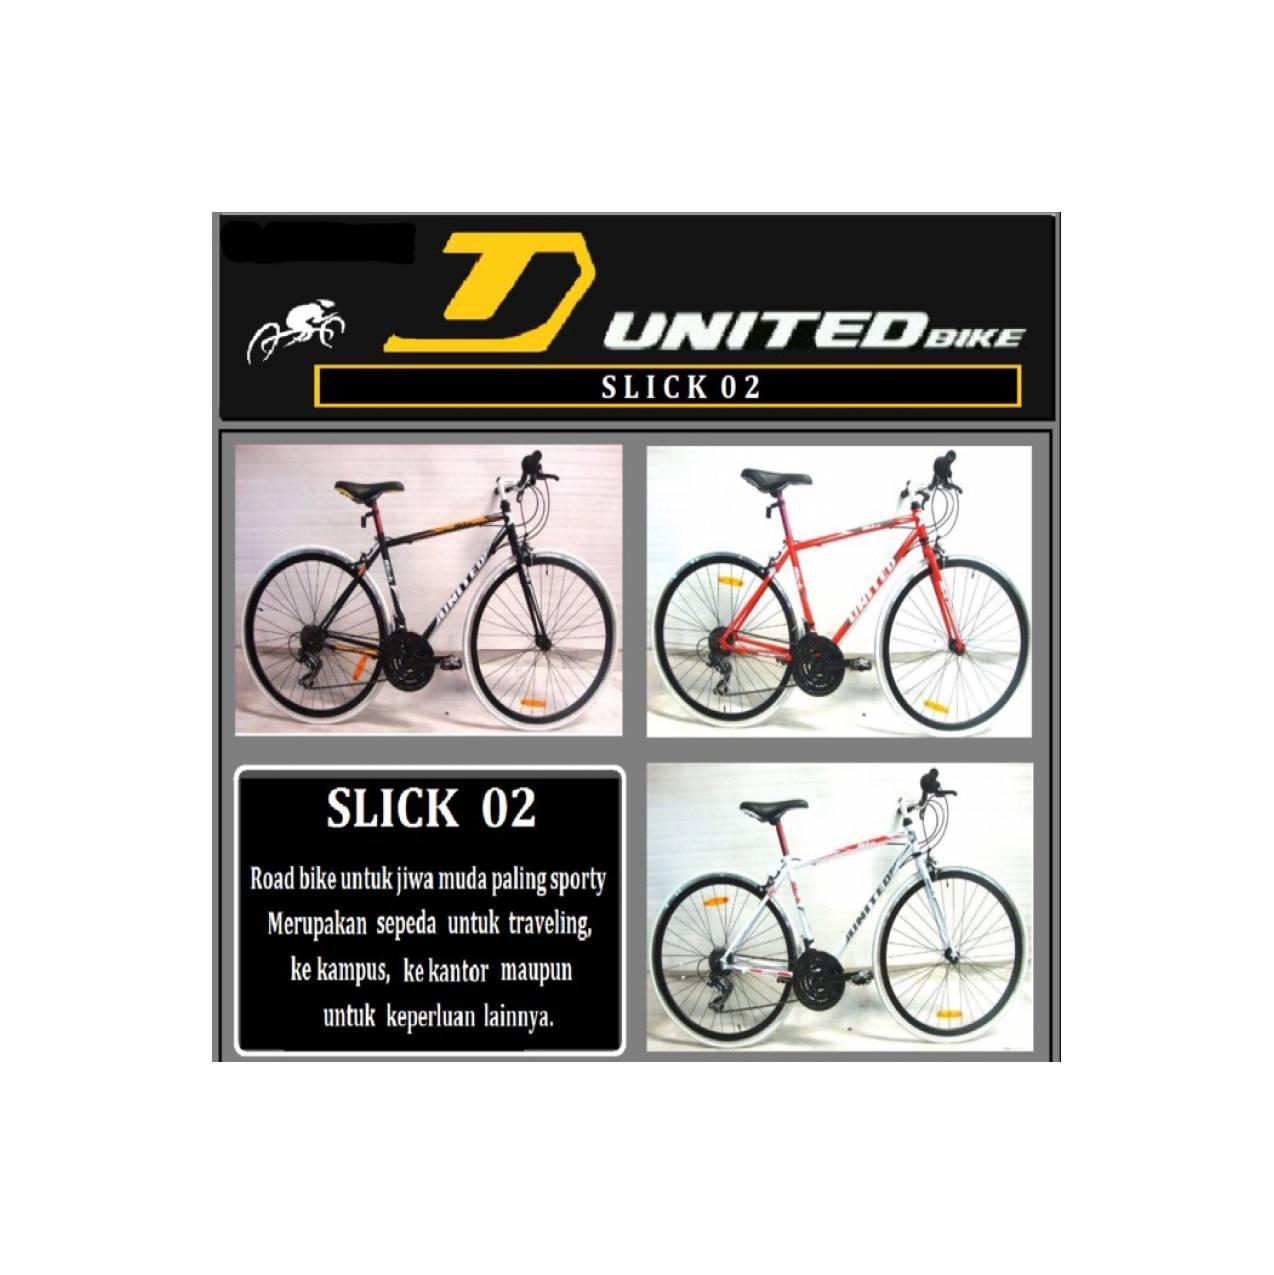 Sepeda Semi Balap 700c United Slick 02